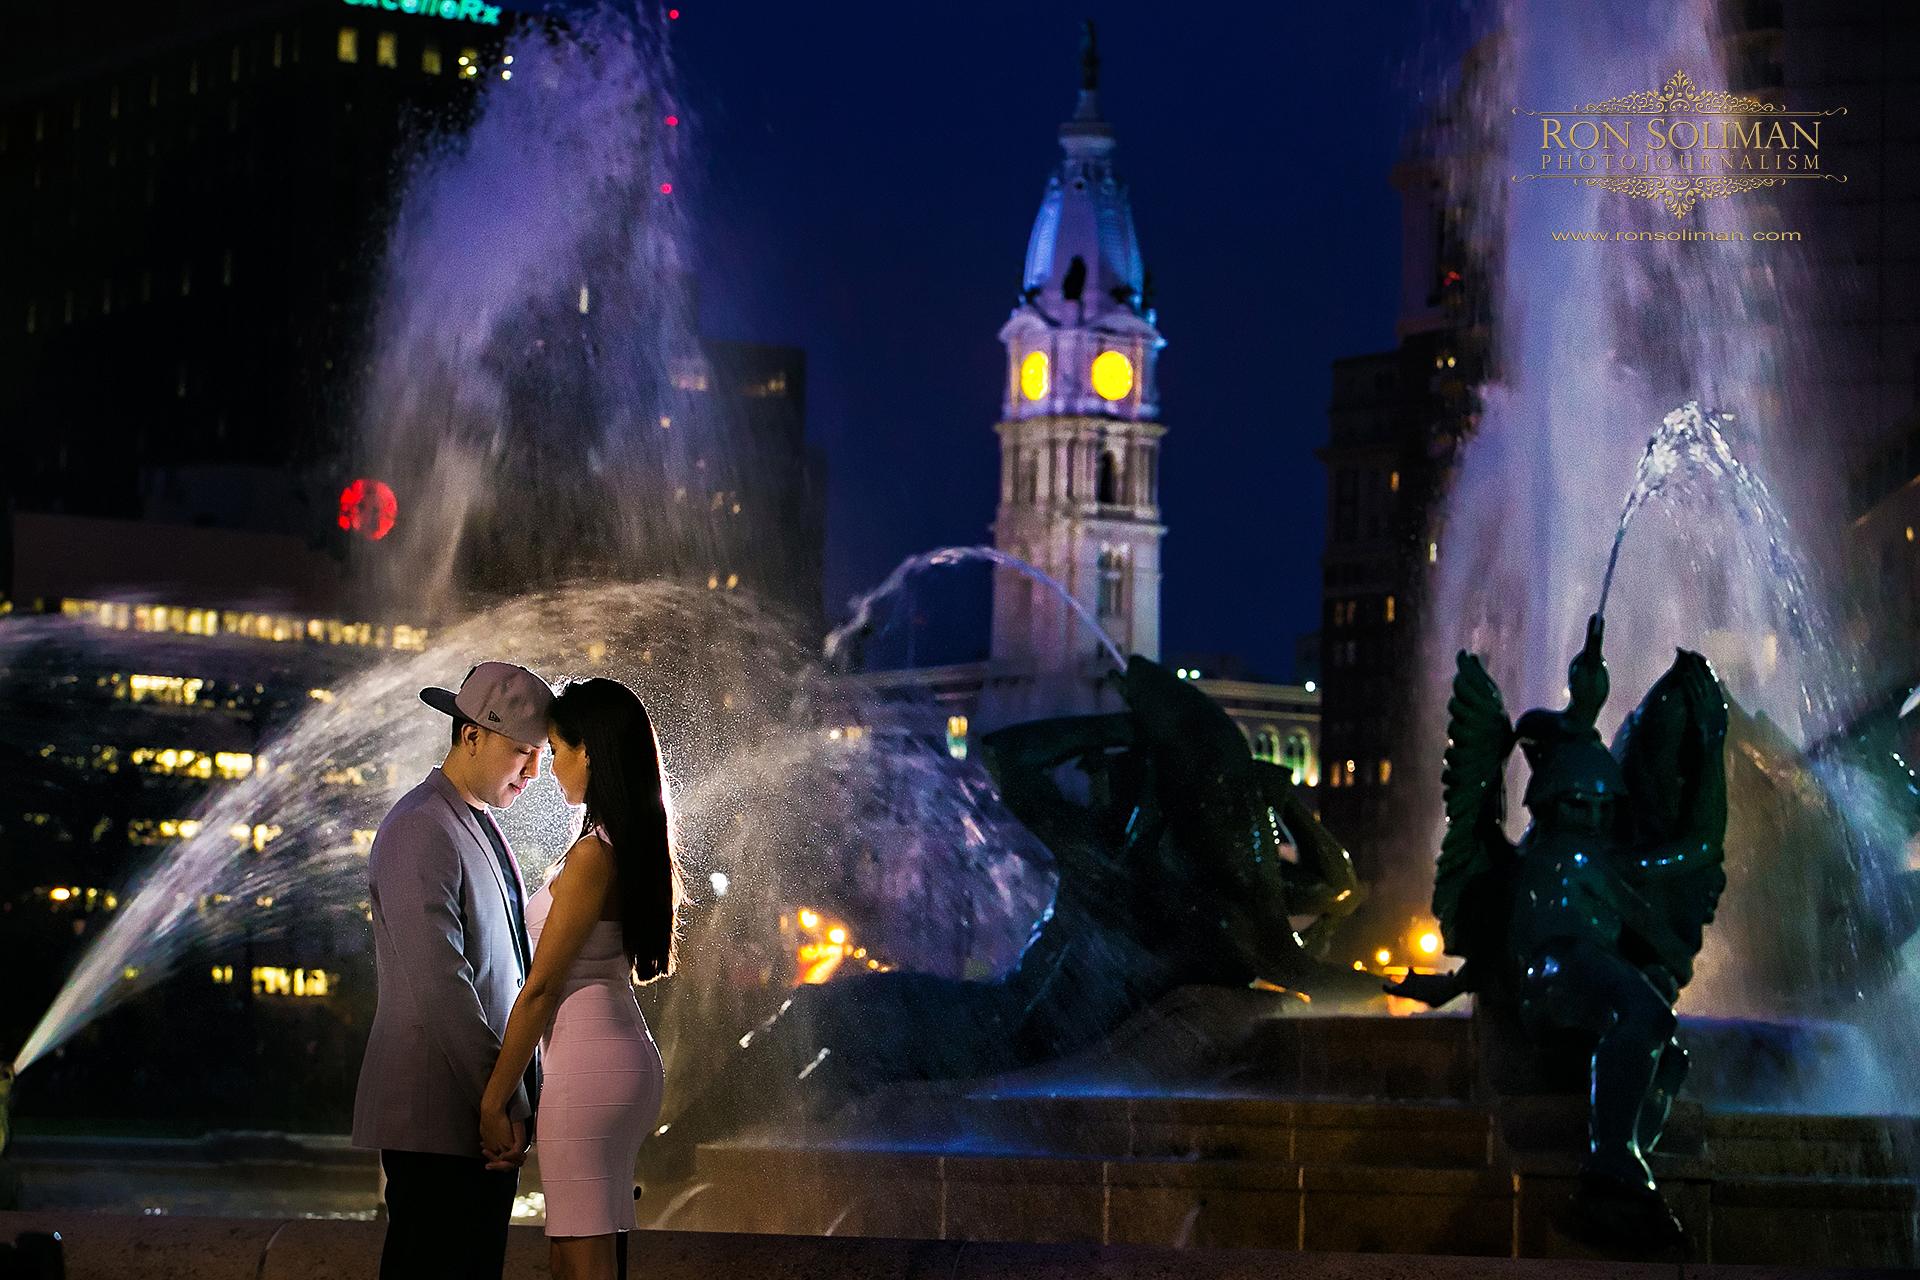 PHILADELPHIA EAGLES CHEERLEADER WEDDING